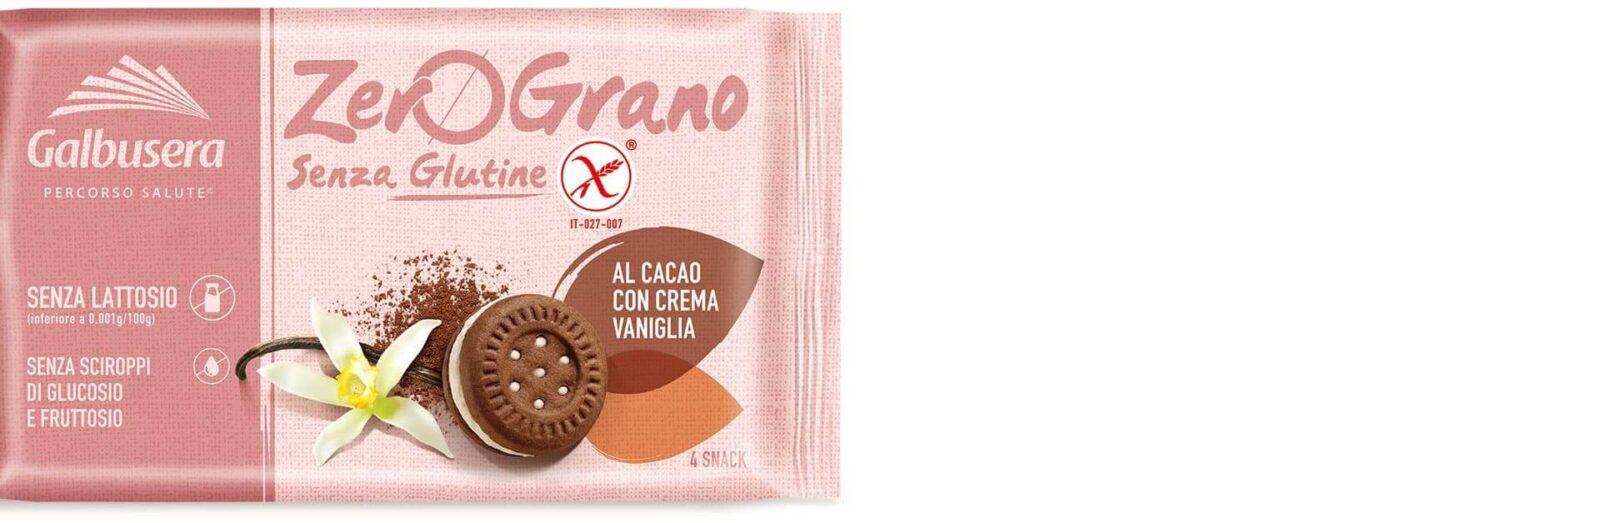 Ciastka z kakao i wanilią Zerograno Galbusera gluten free 160g